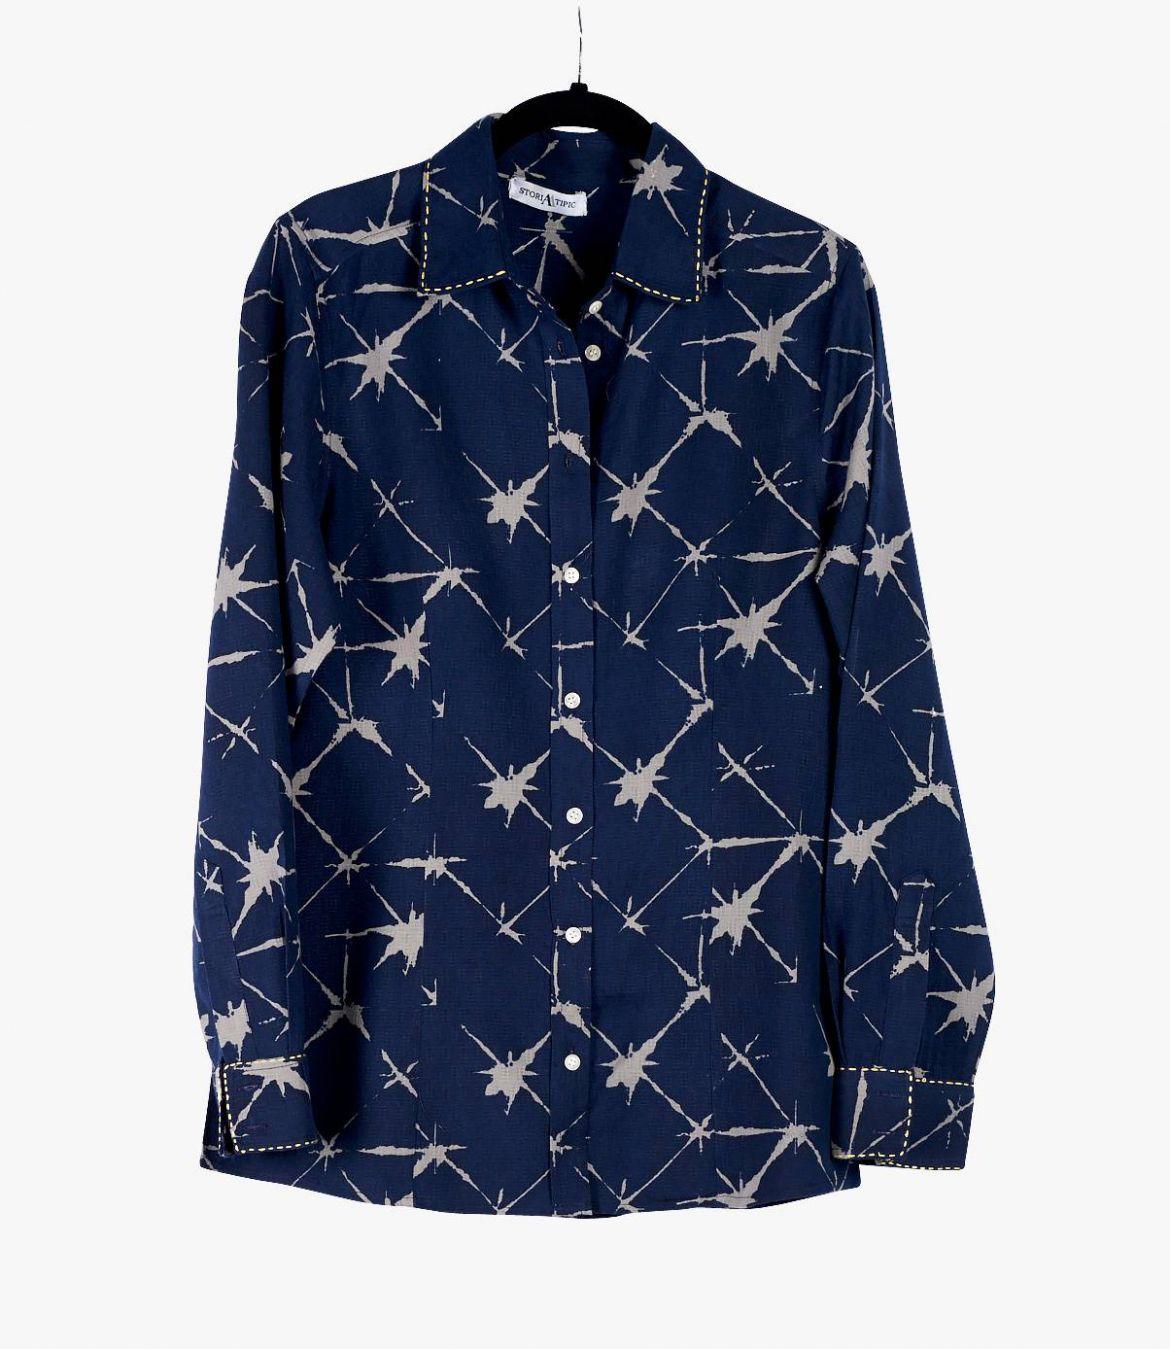 BONI KDO Cotton Shirt, Modal for Women Storiatipic - 2